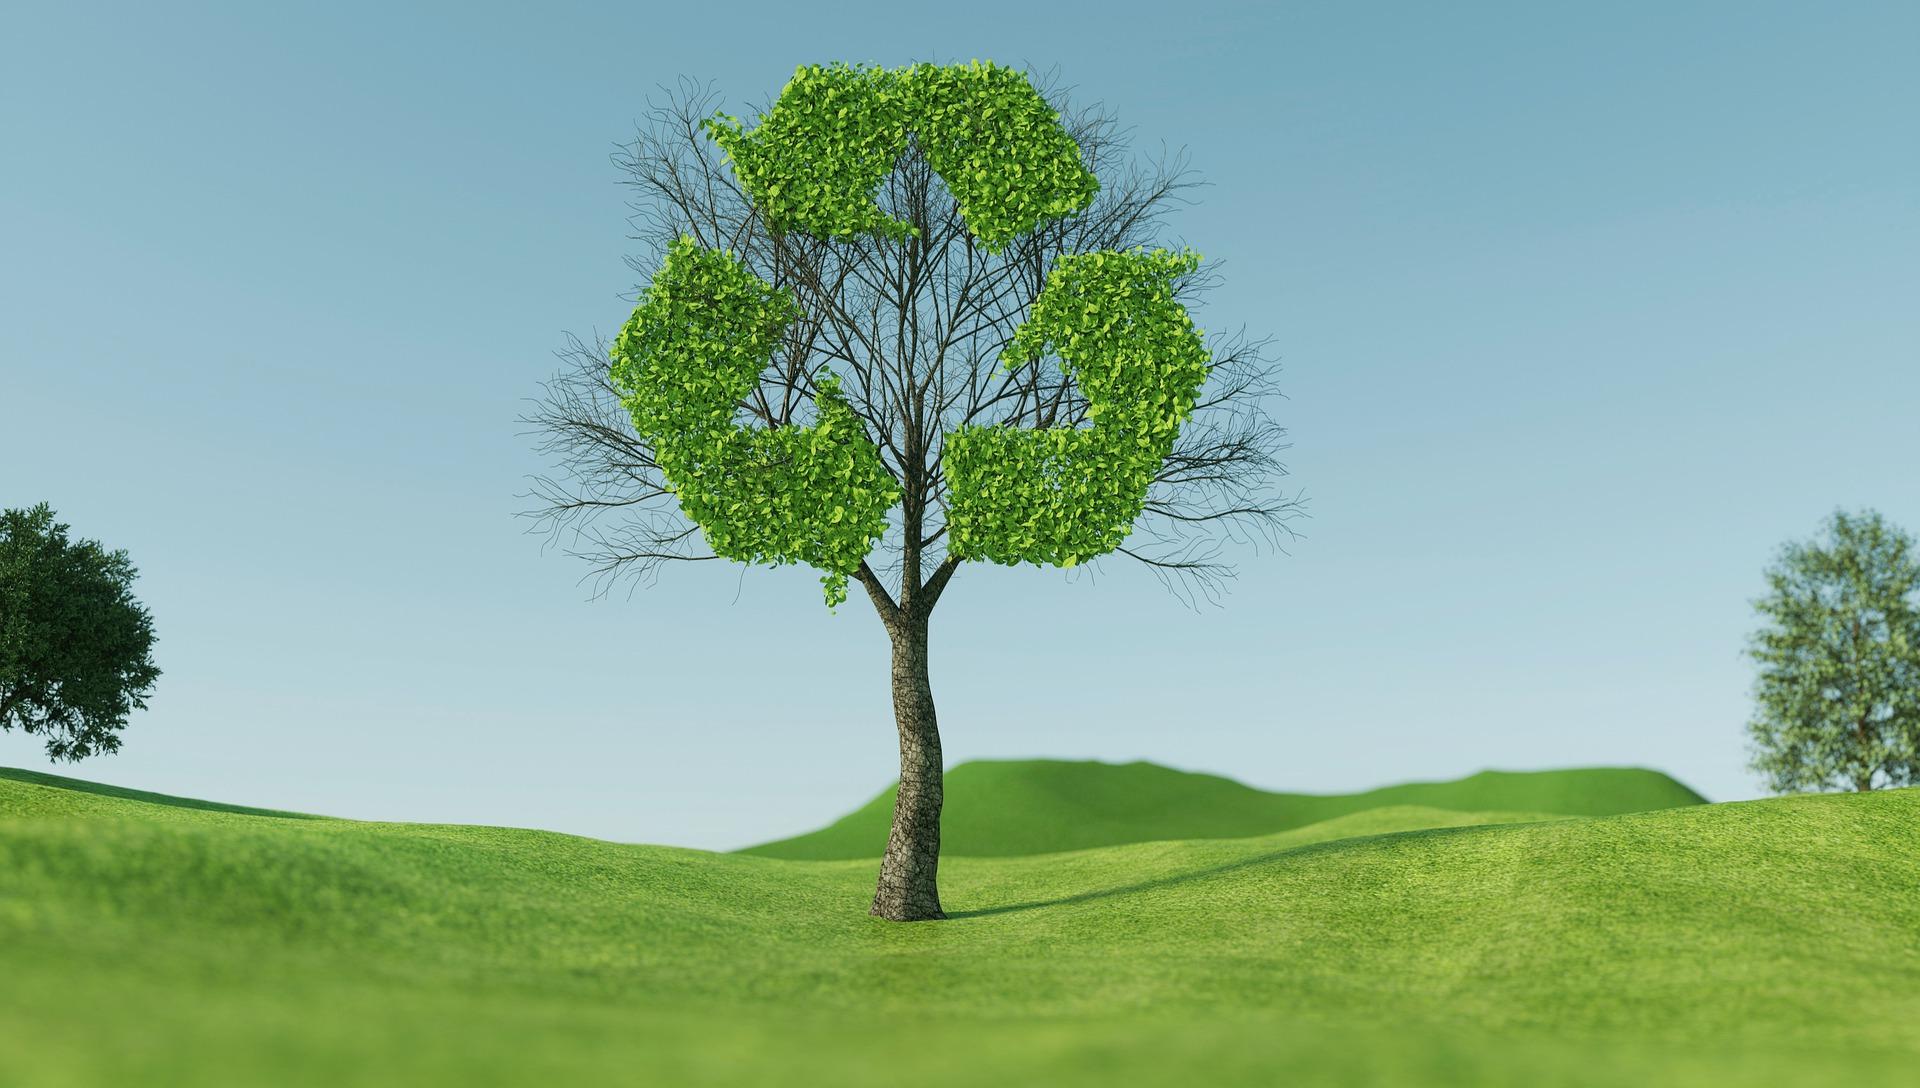 recycle_awareness_tree_image